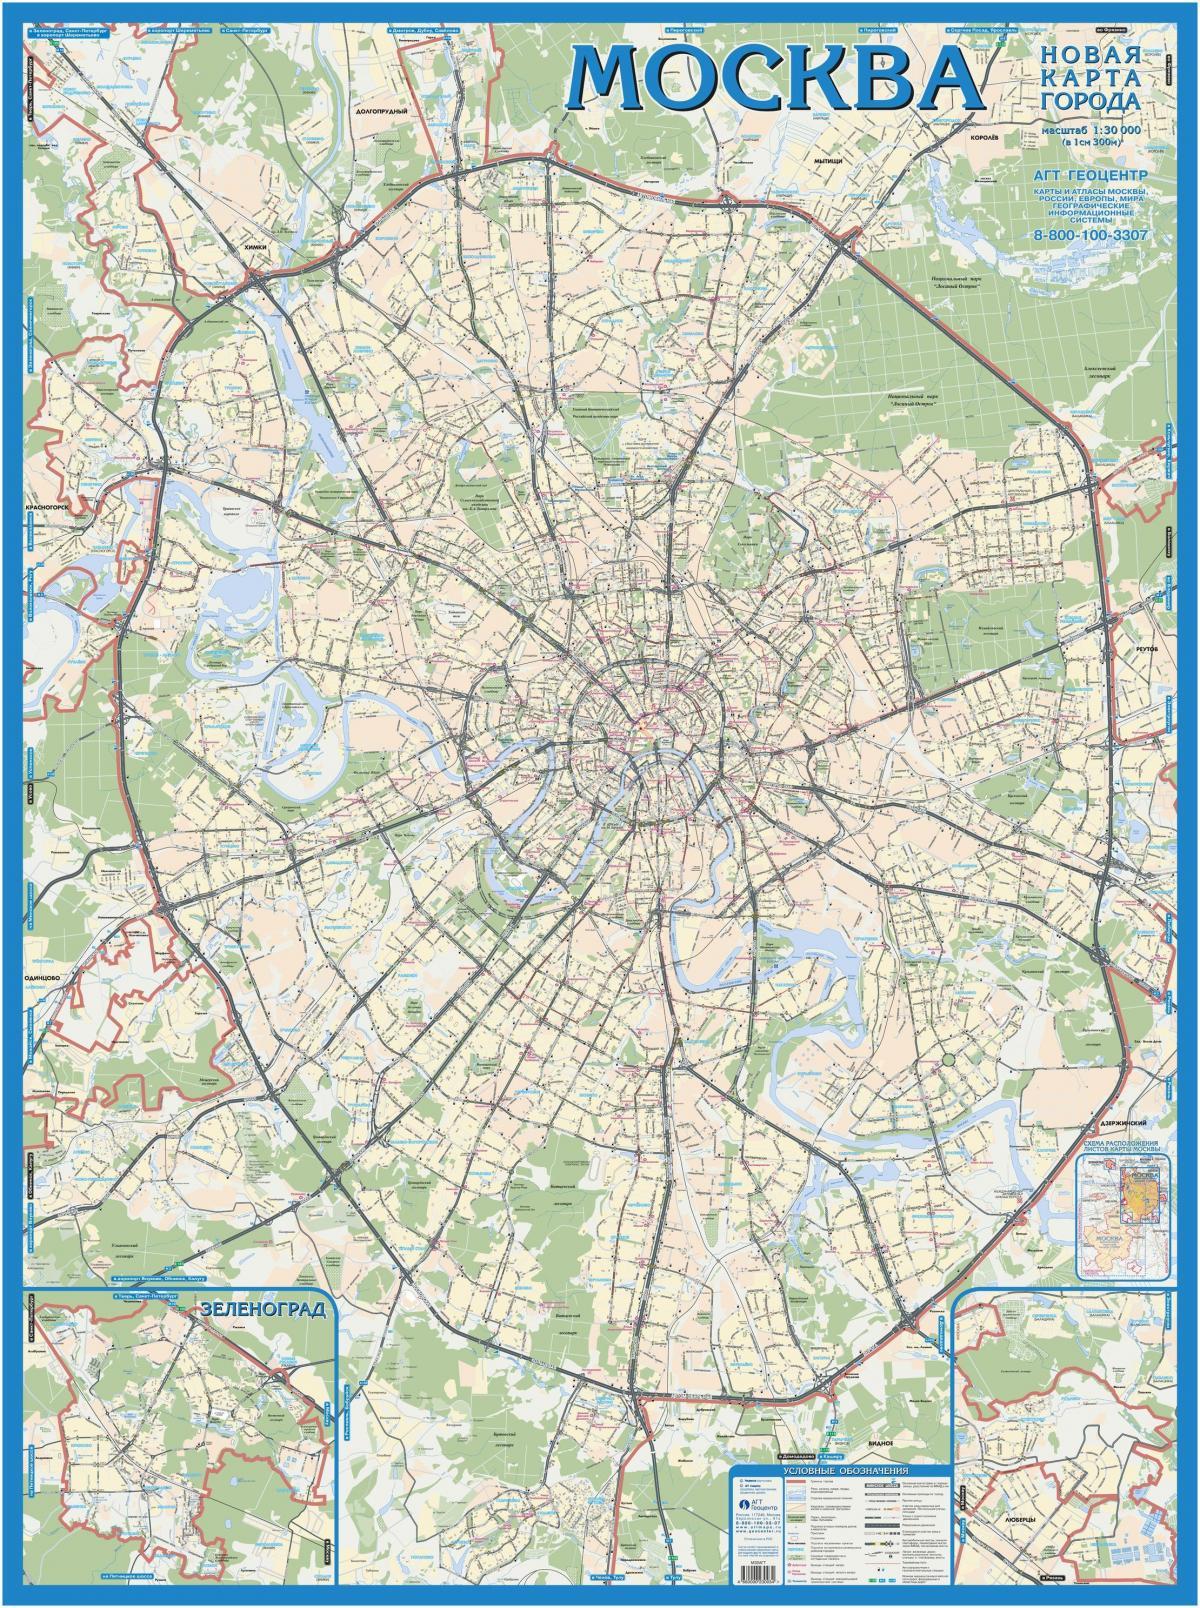 topografisk kart Moskva topografiske kart   Moskva topografiske kart (Russland) topografisk kart